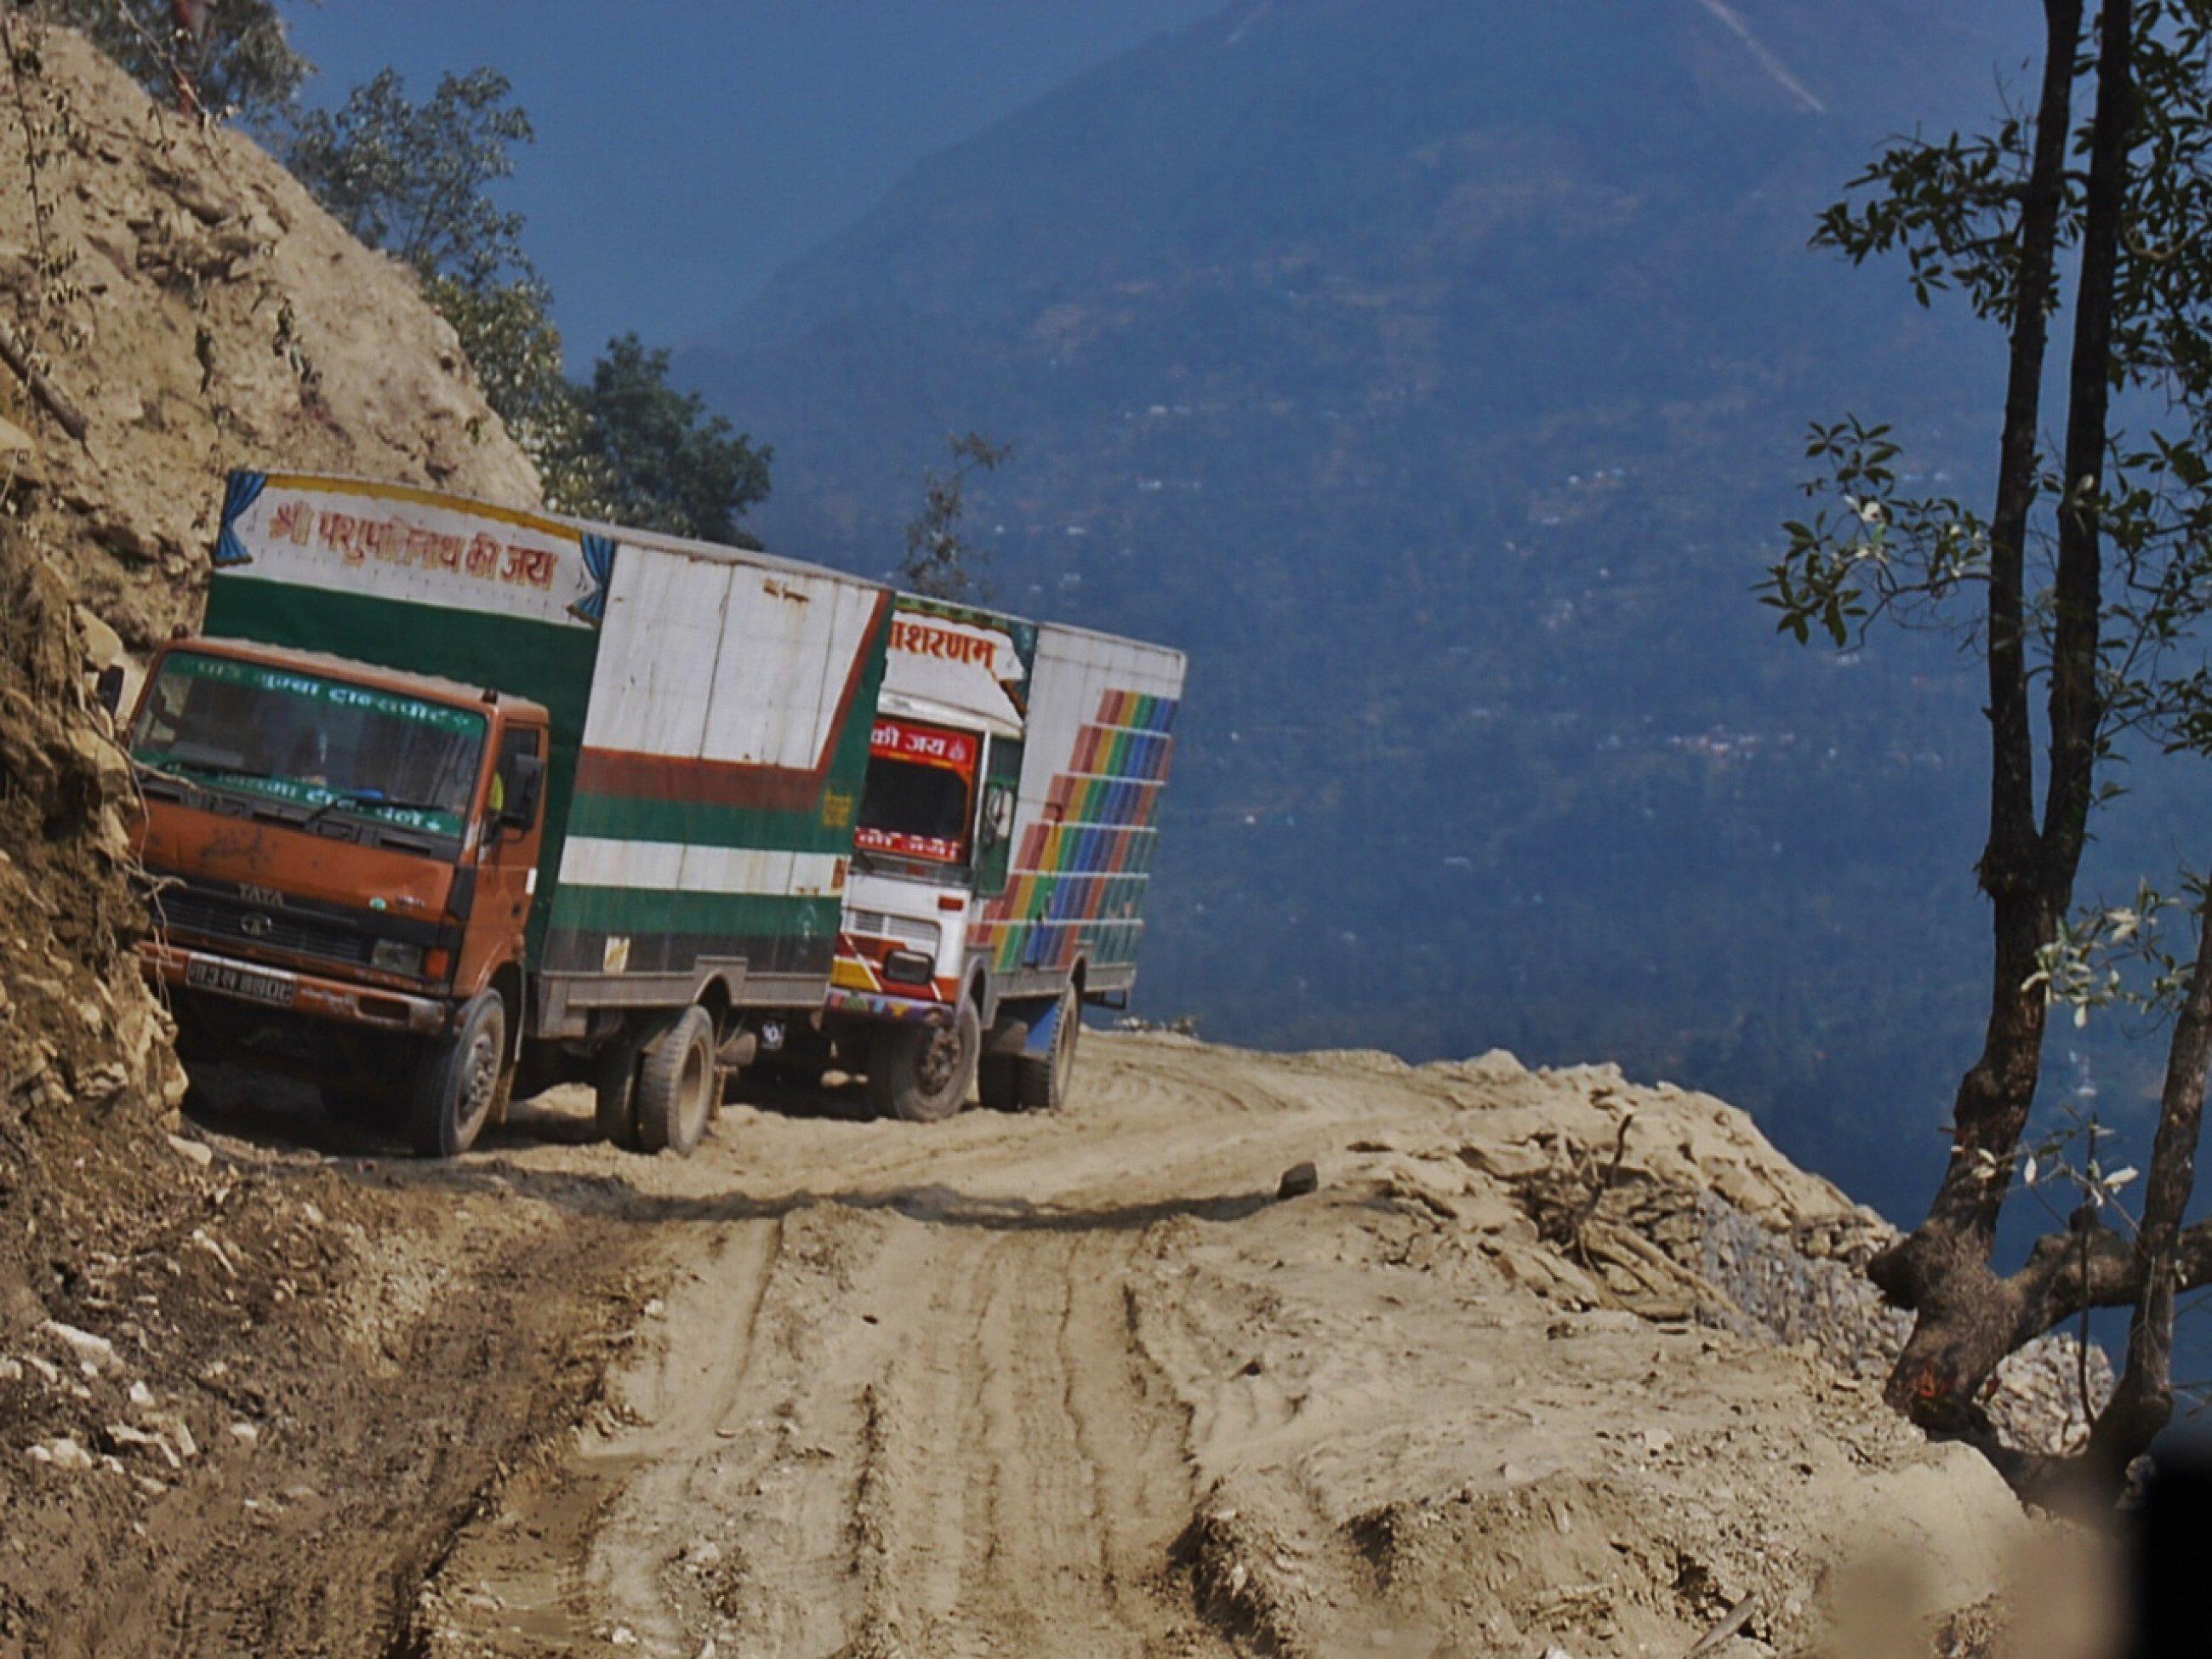 https://bubo.sk/uploads/galleries/3467/nepal-ctni-11-2014-mirka-sulka-329-.jpg